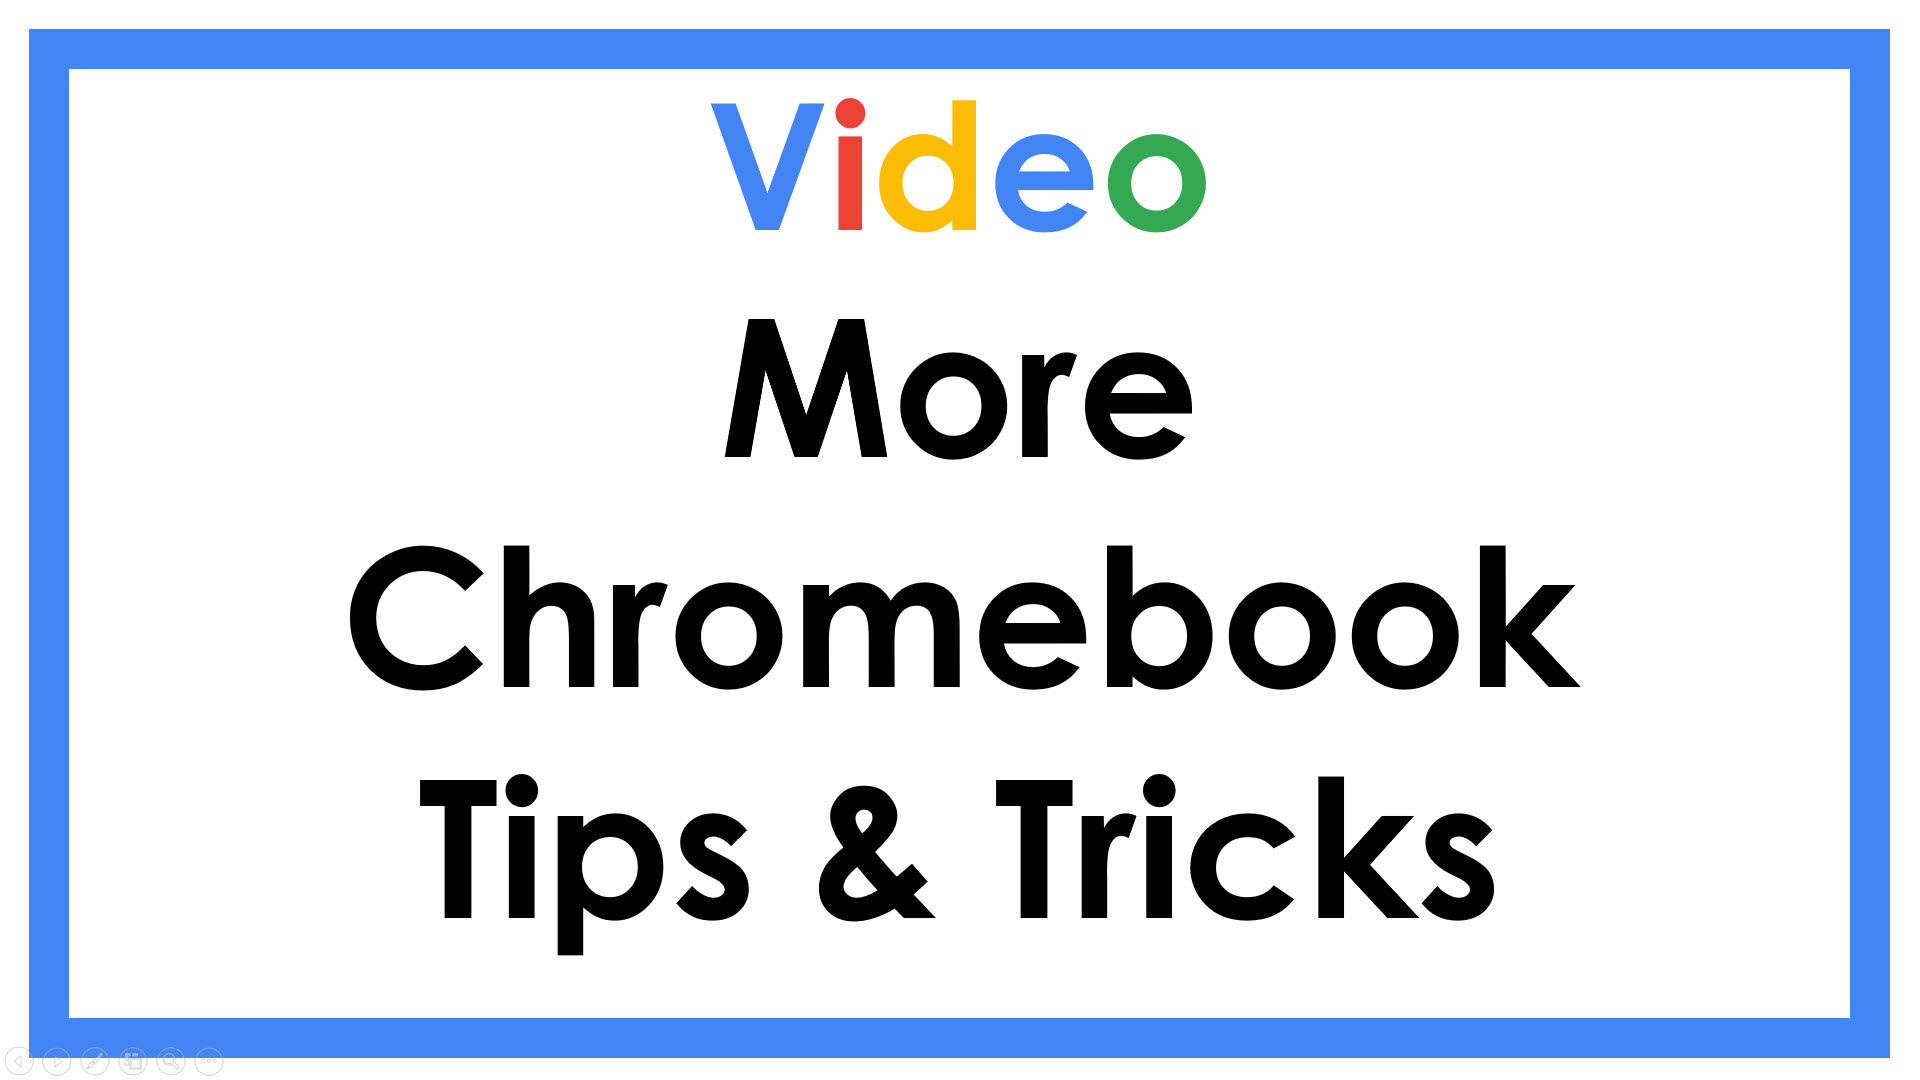 Video More Chromebook Tips & Tricks